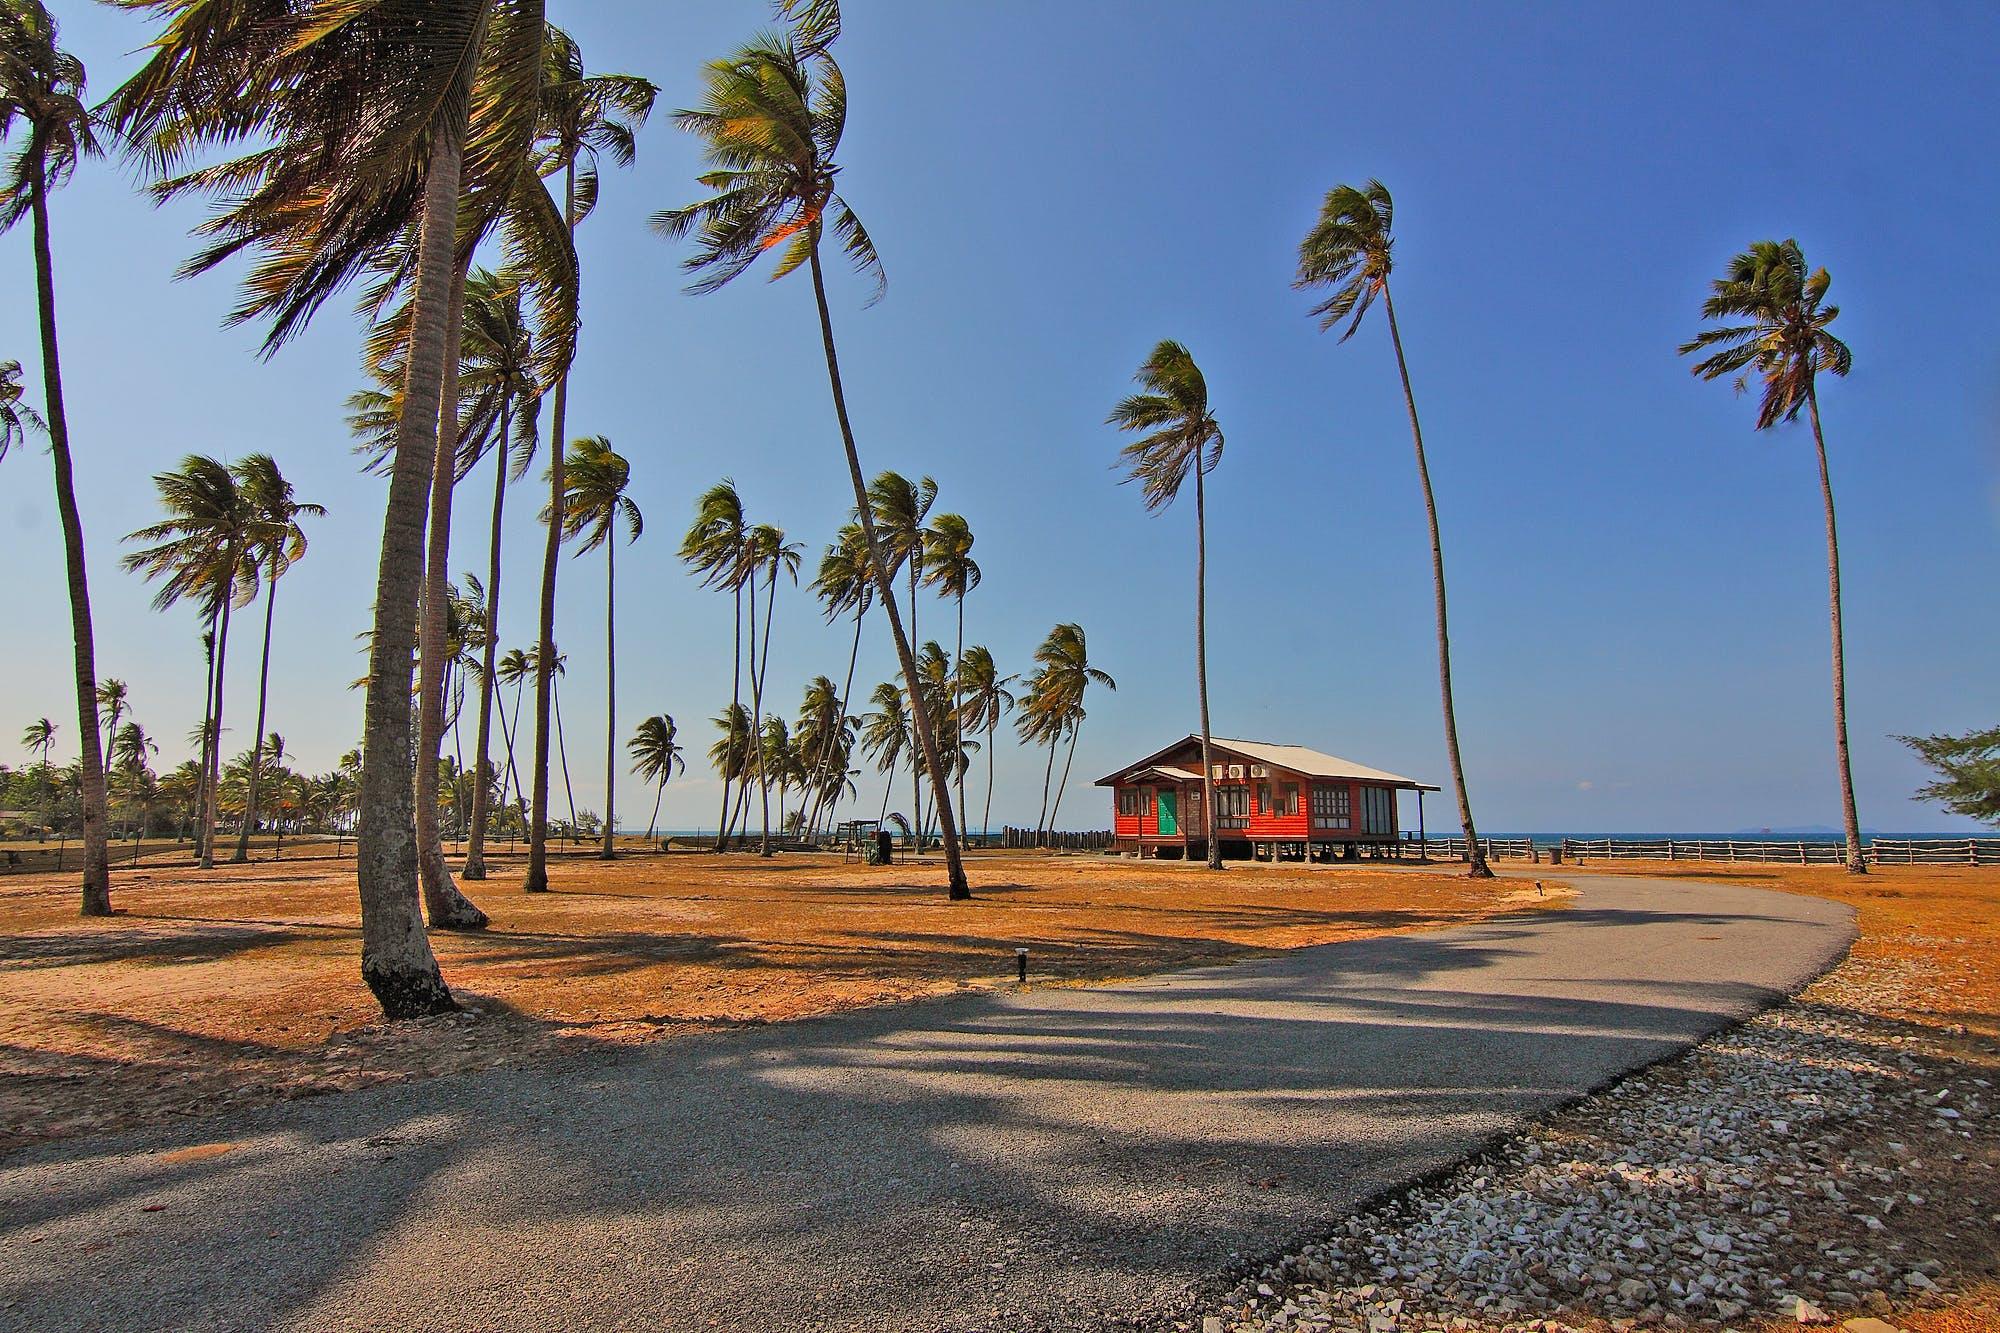 Coconut Trees on Land